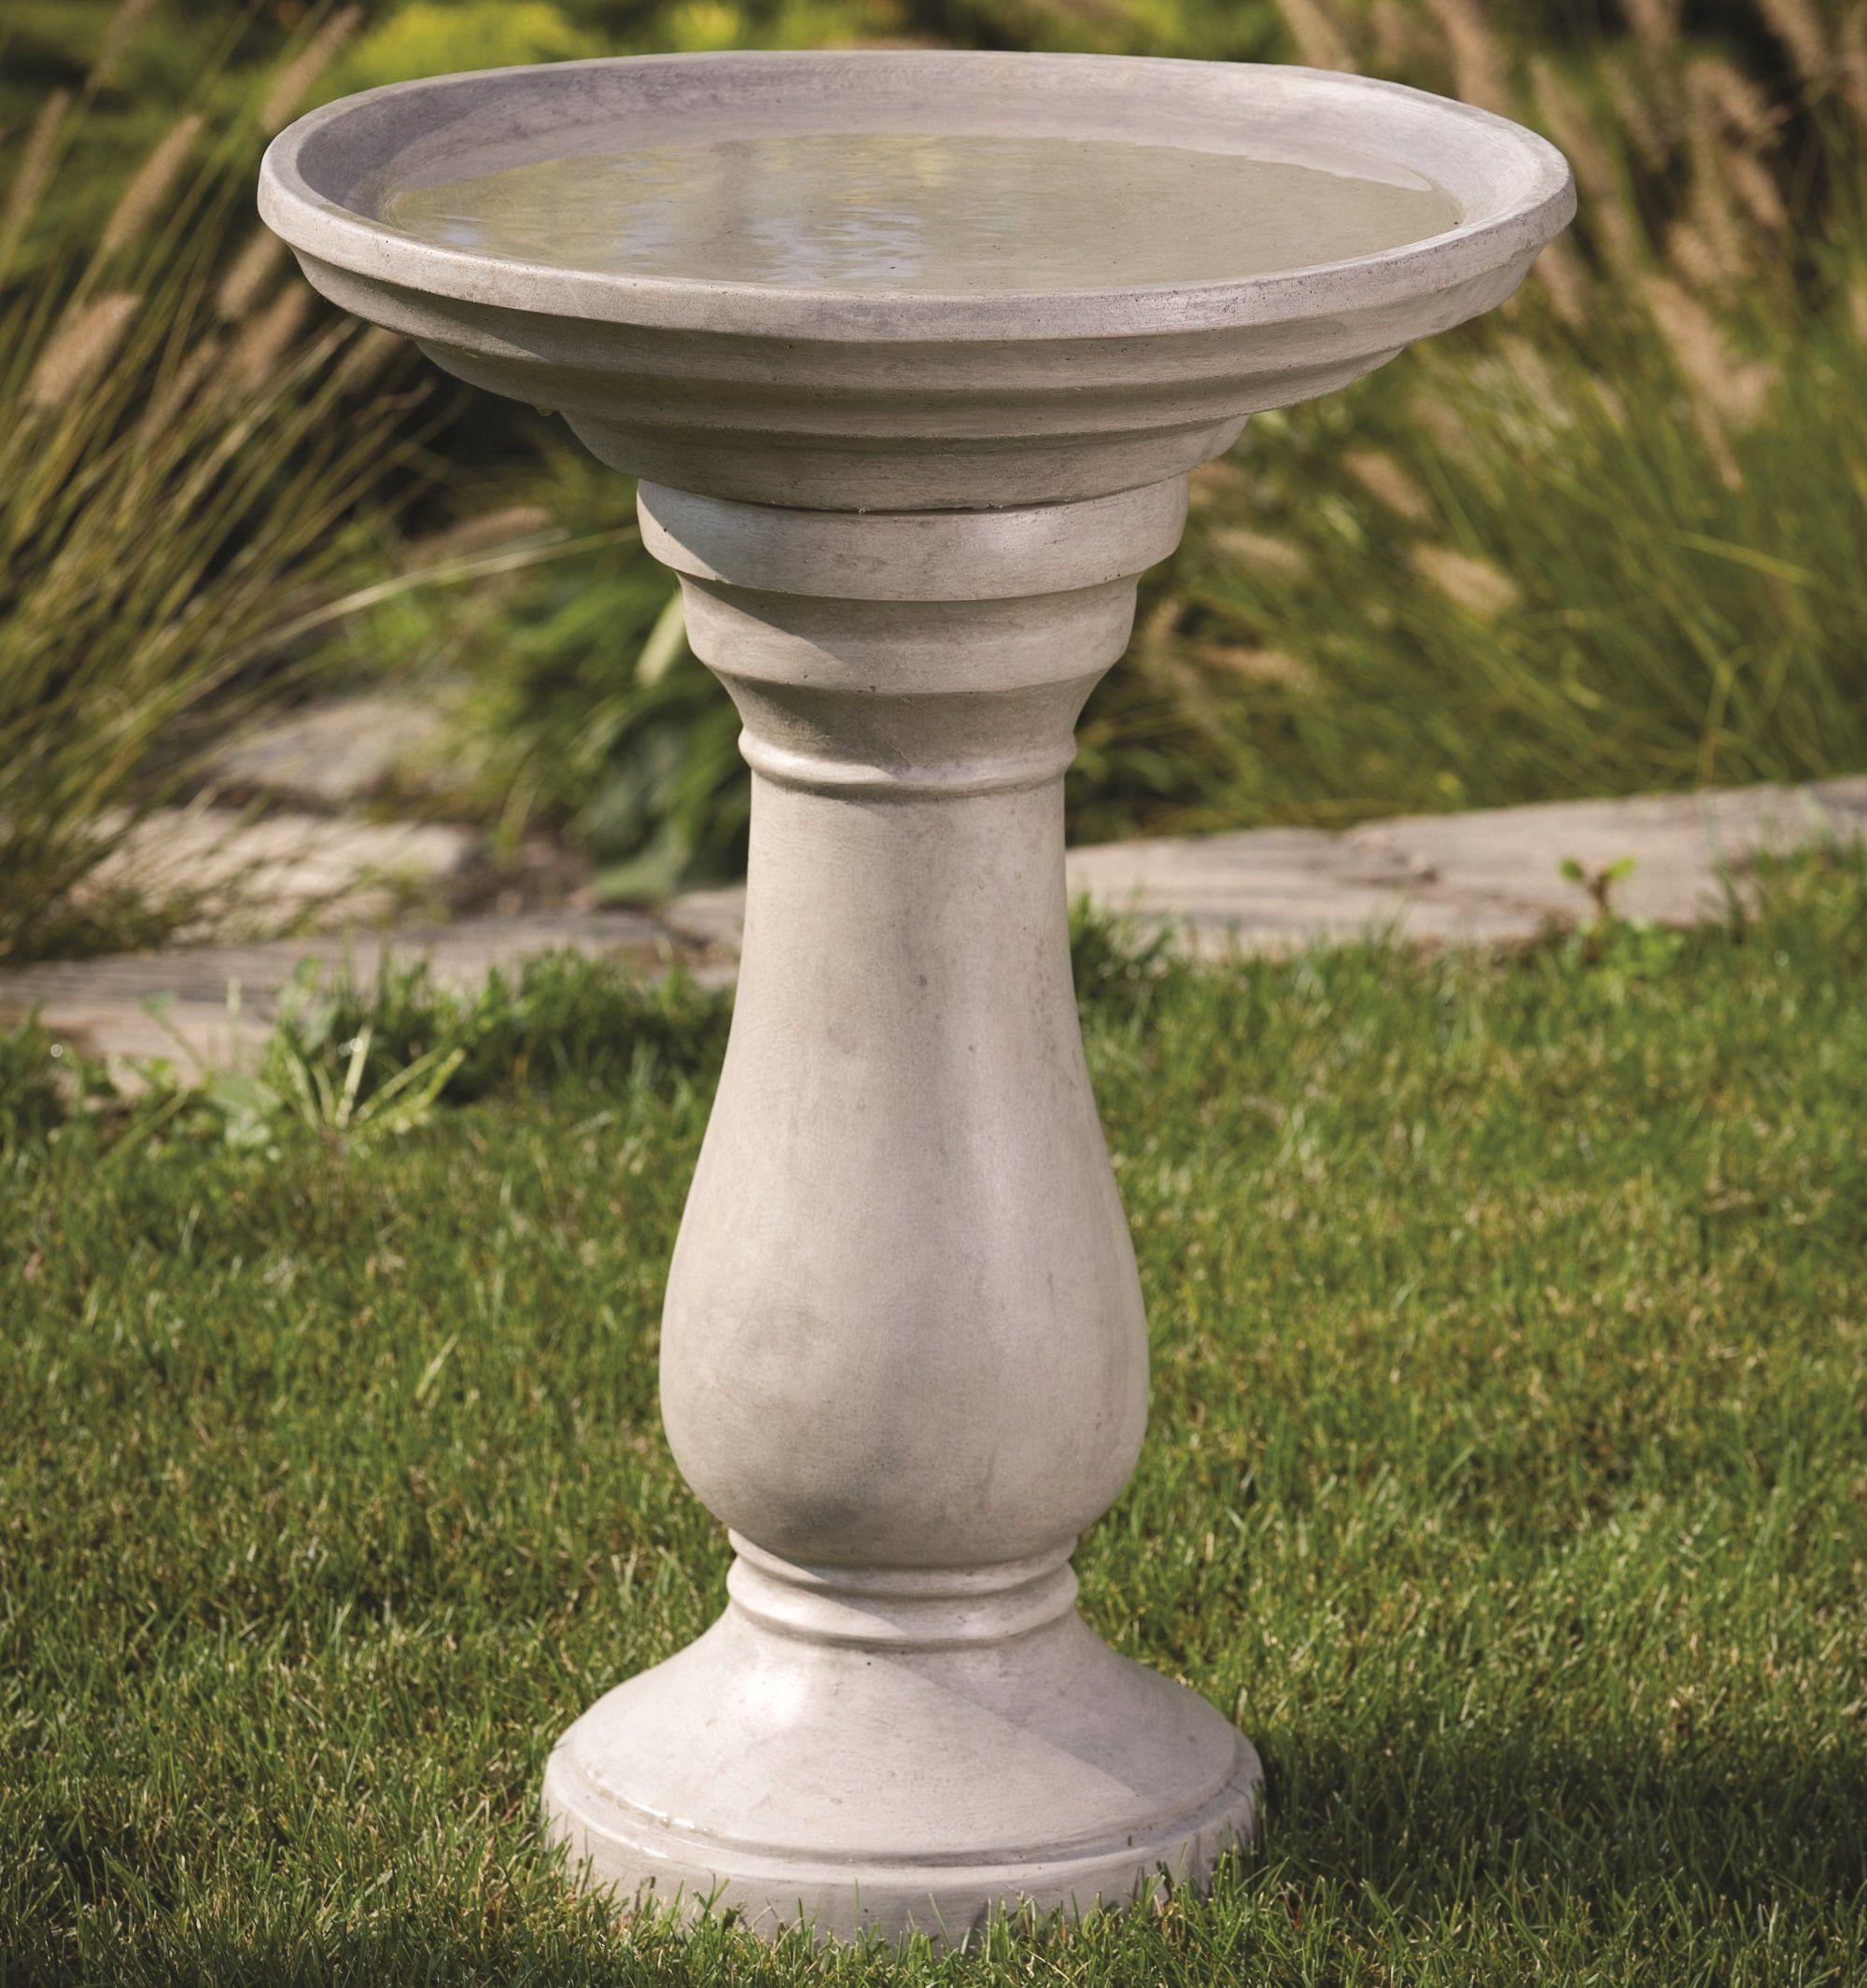 photo garden american urns pedestals concrete urn x pedestal painted vintage and of